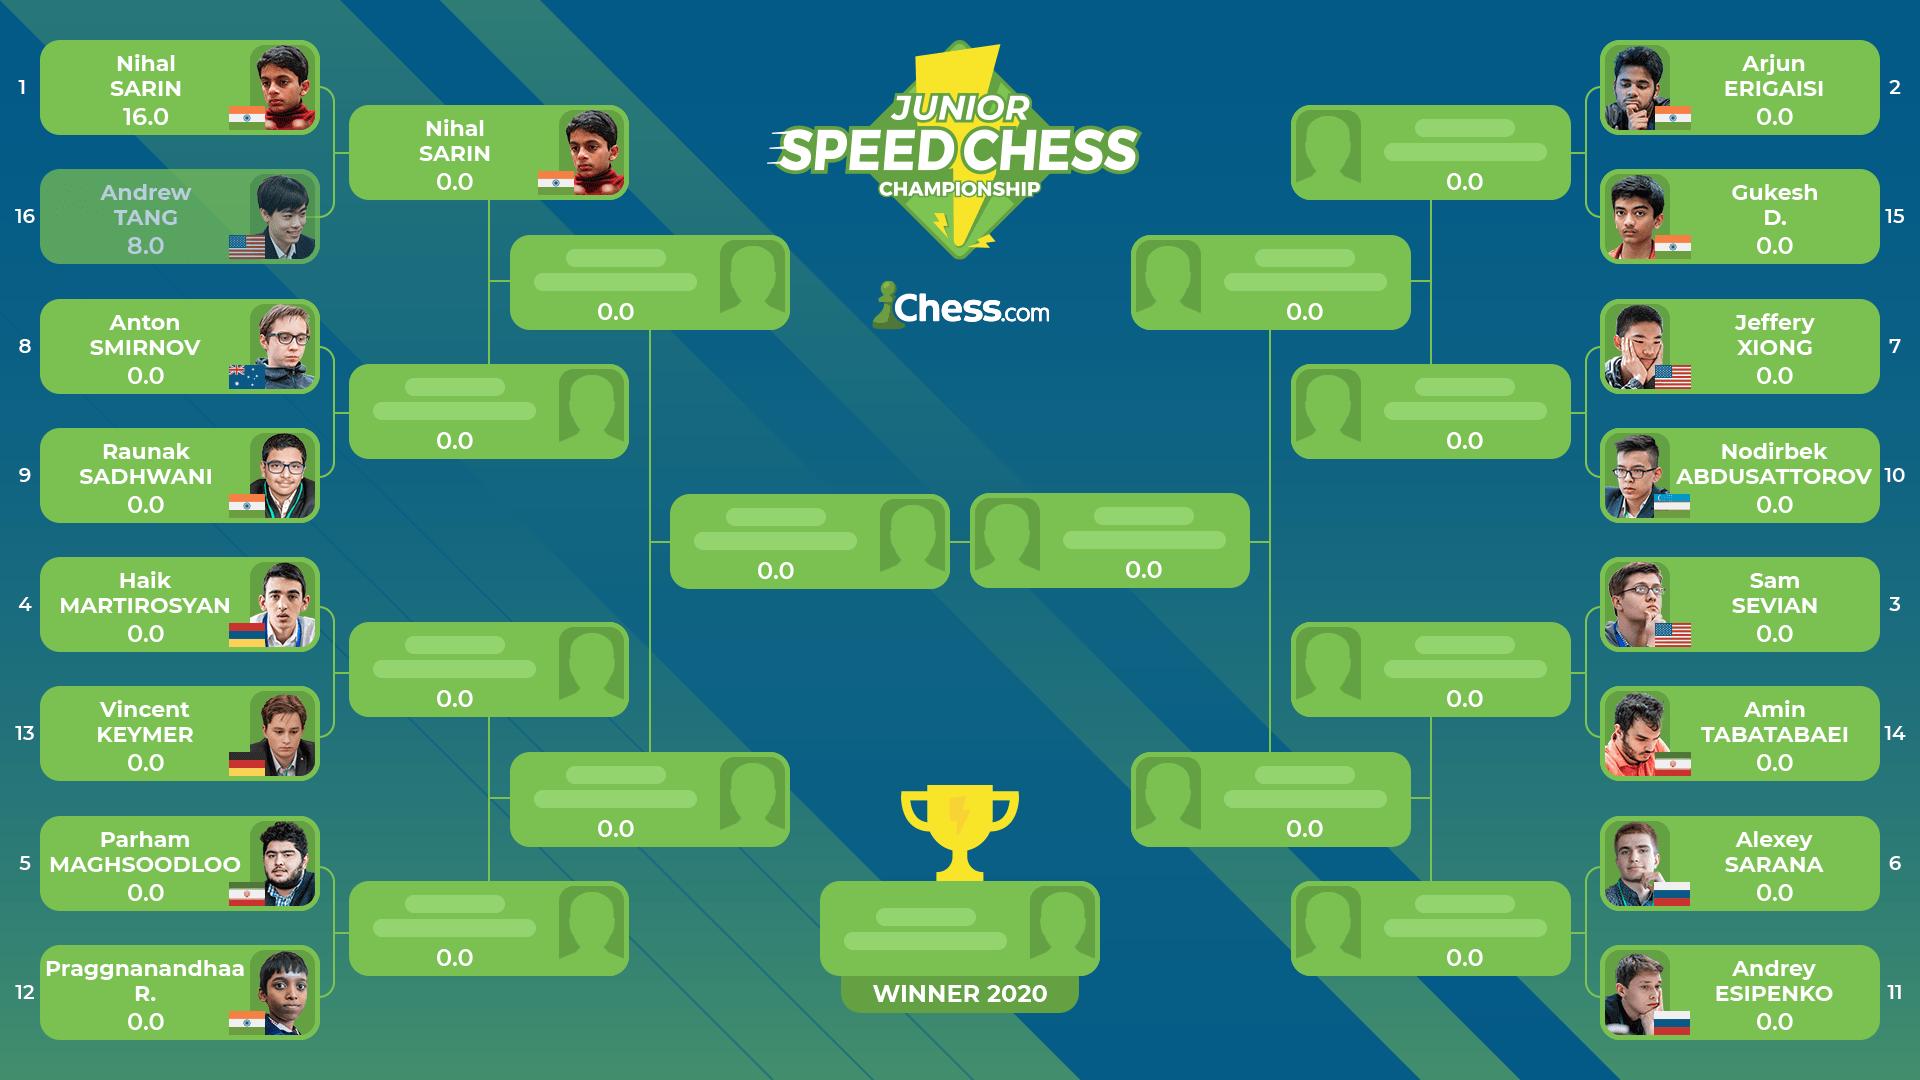 2020 Junior Speed Chess Championship bracket